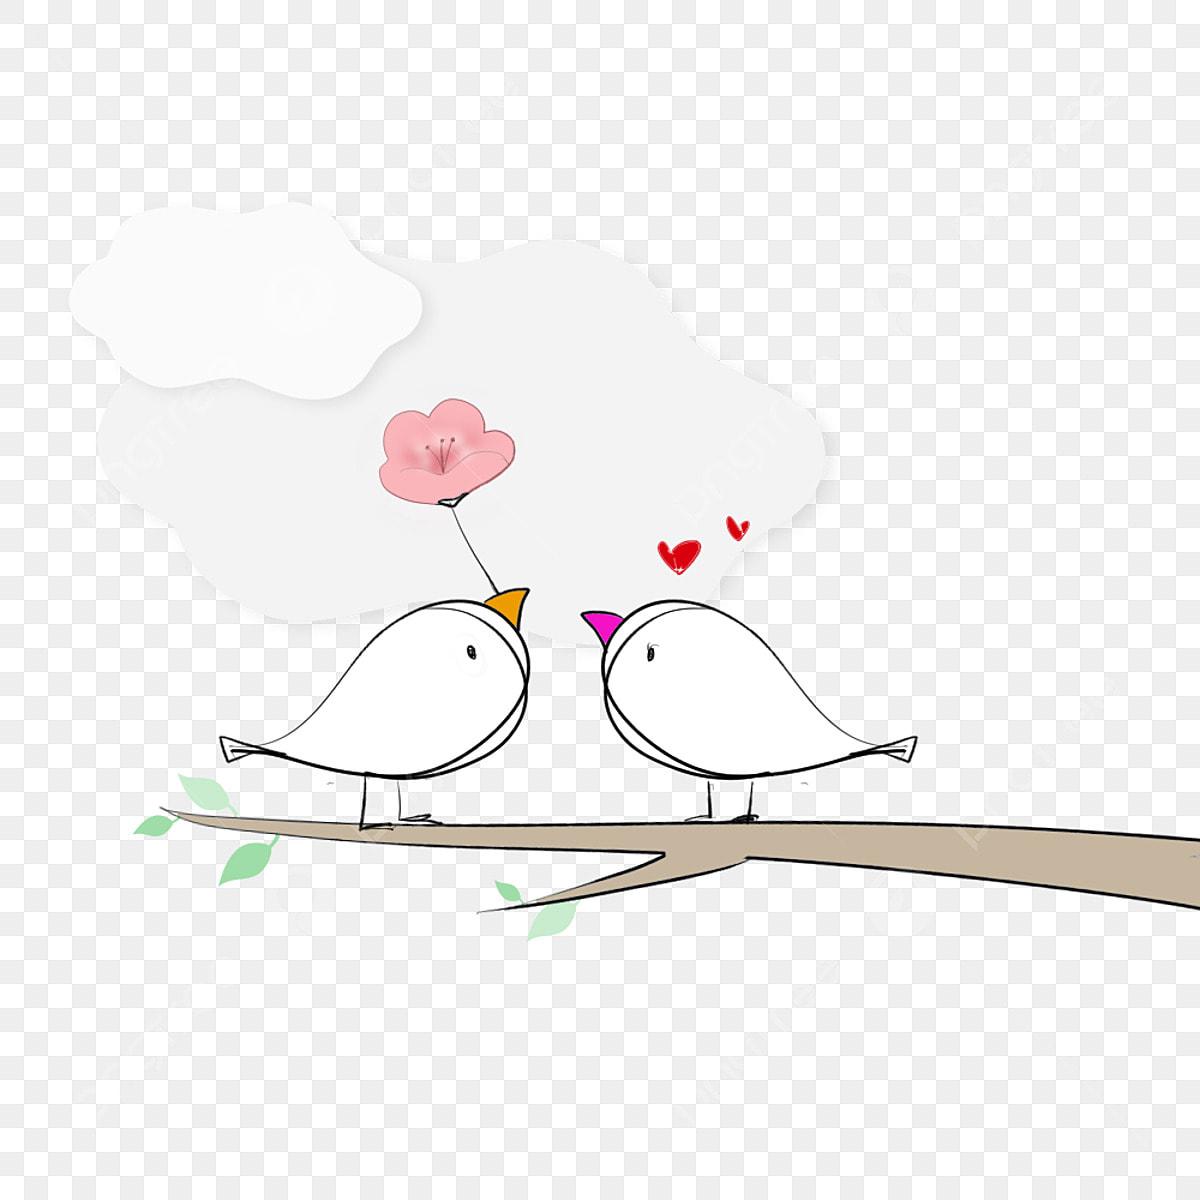 98  Gambar Burung Elang Mudah Di Tiru HD Paling Keren Free